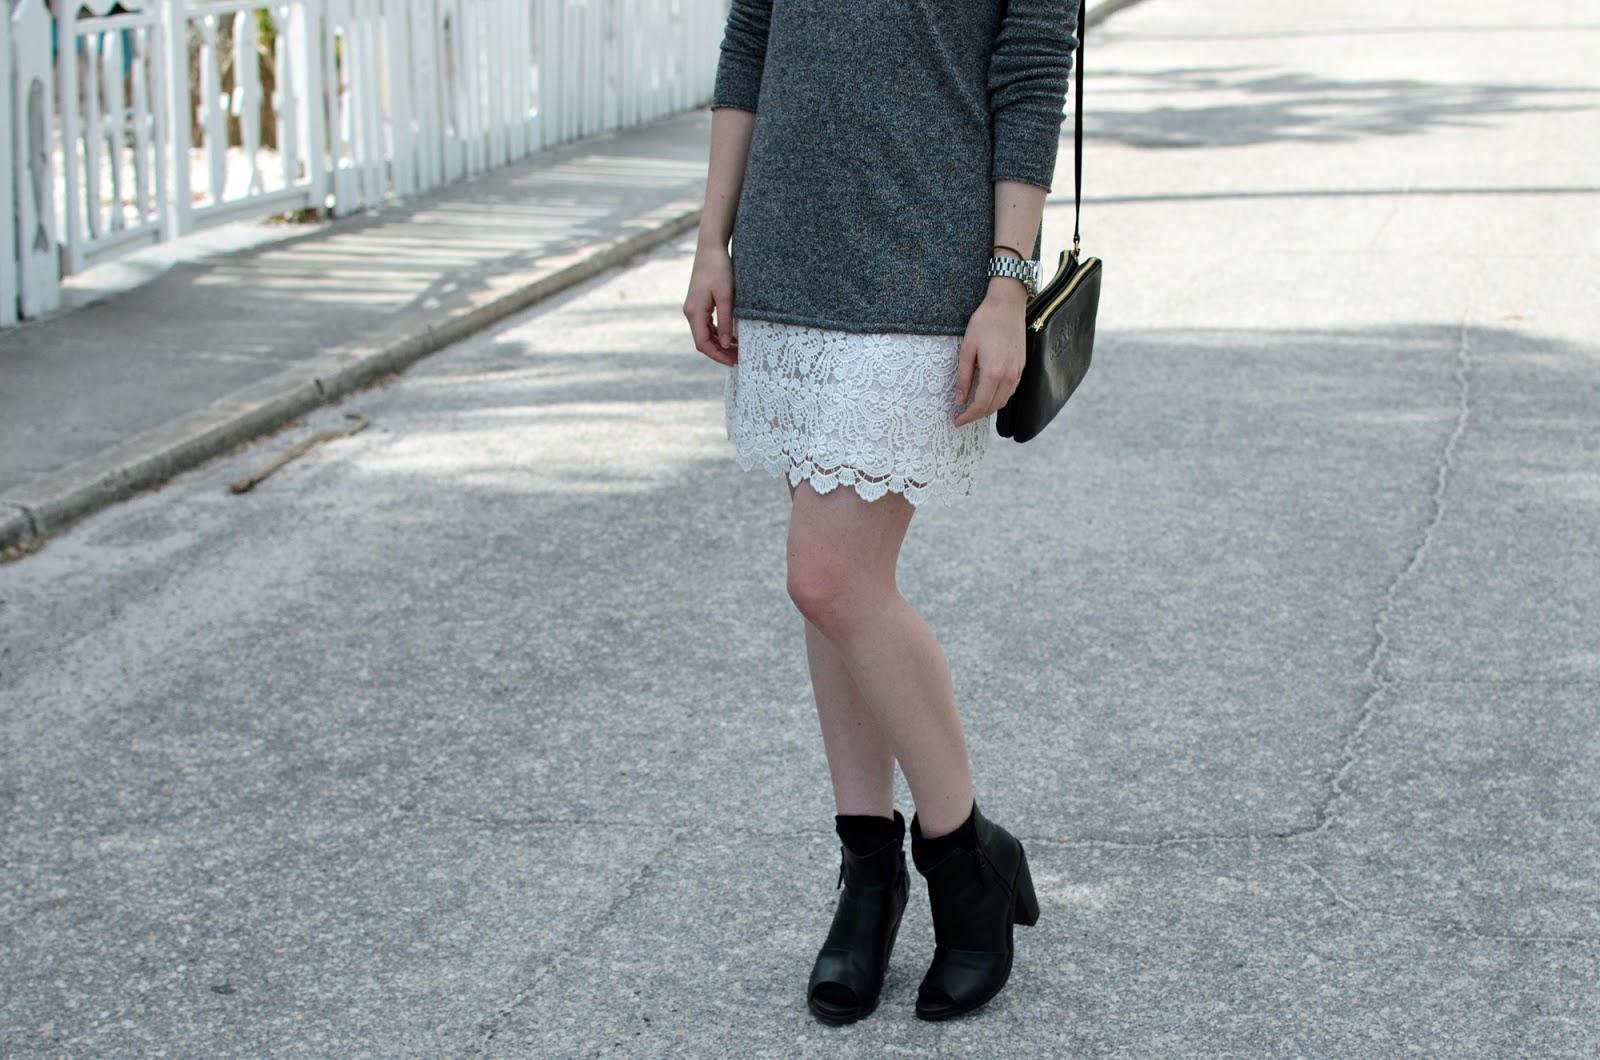 OOTD ft. Zara lace skirt, Aritzia Babaton Erin sweater, Rag & Bone Noelle booties, and a Coach crossbody bag